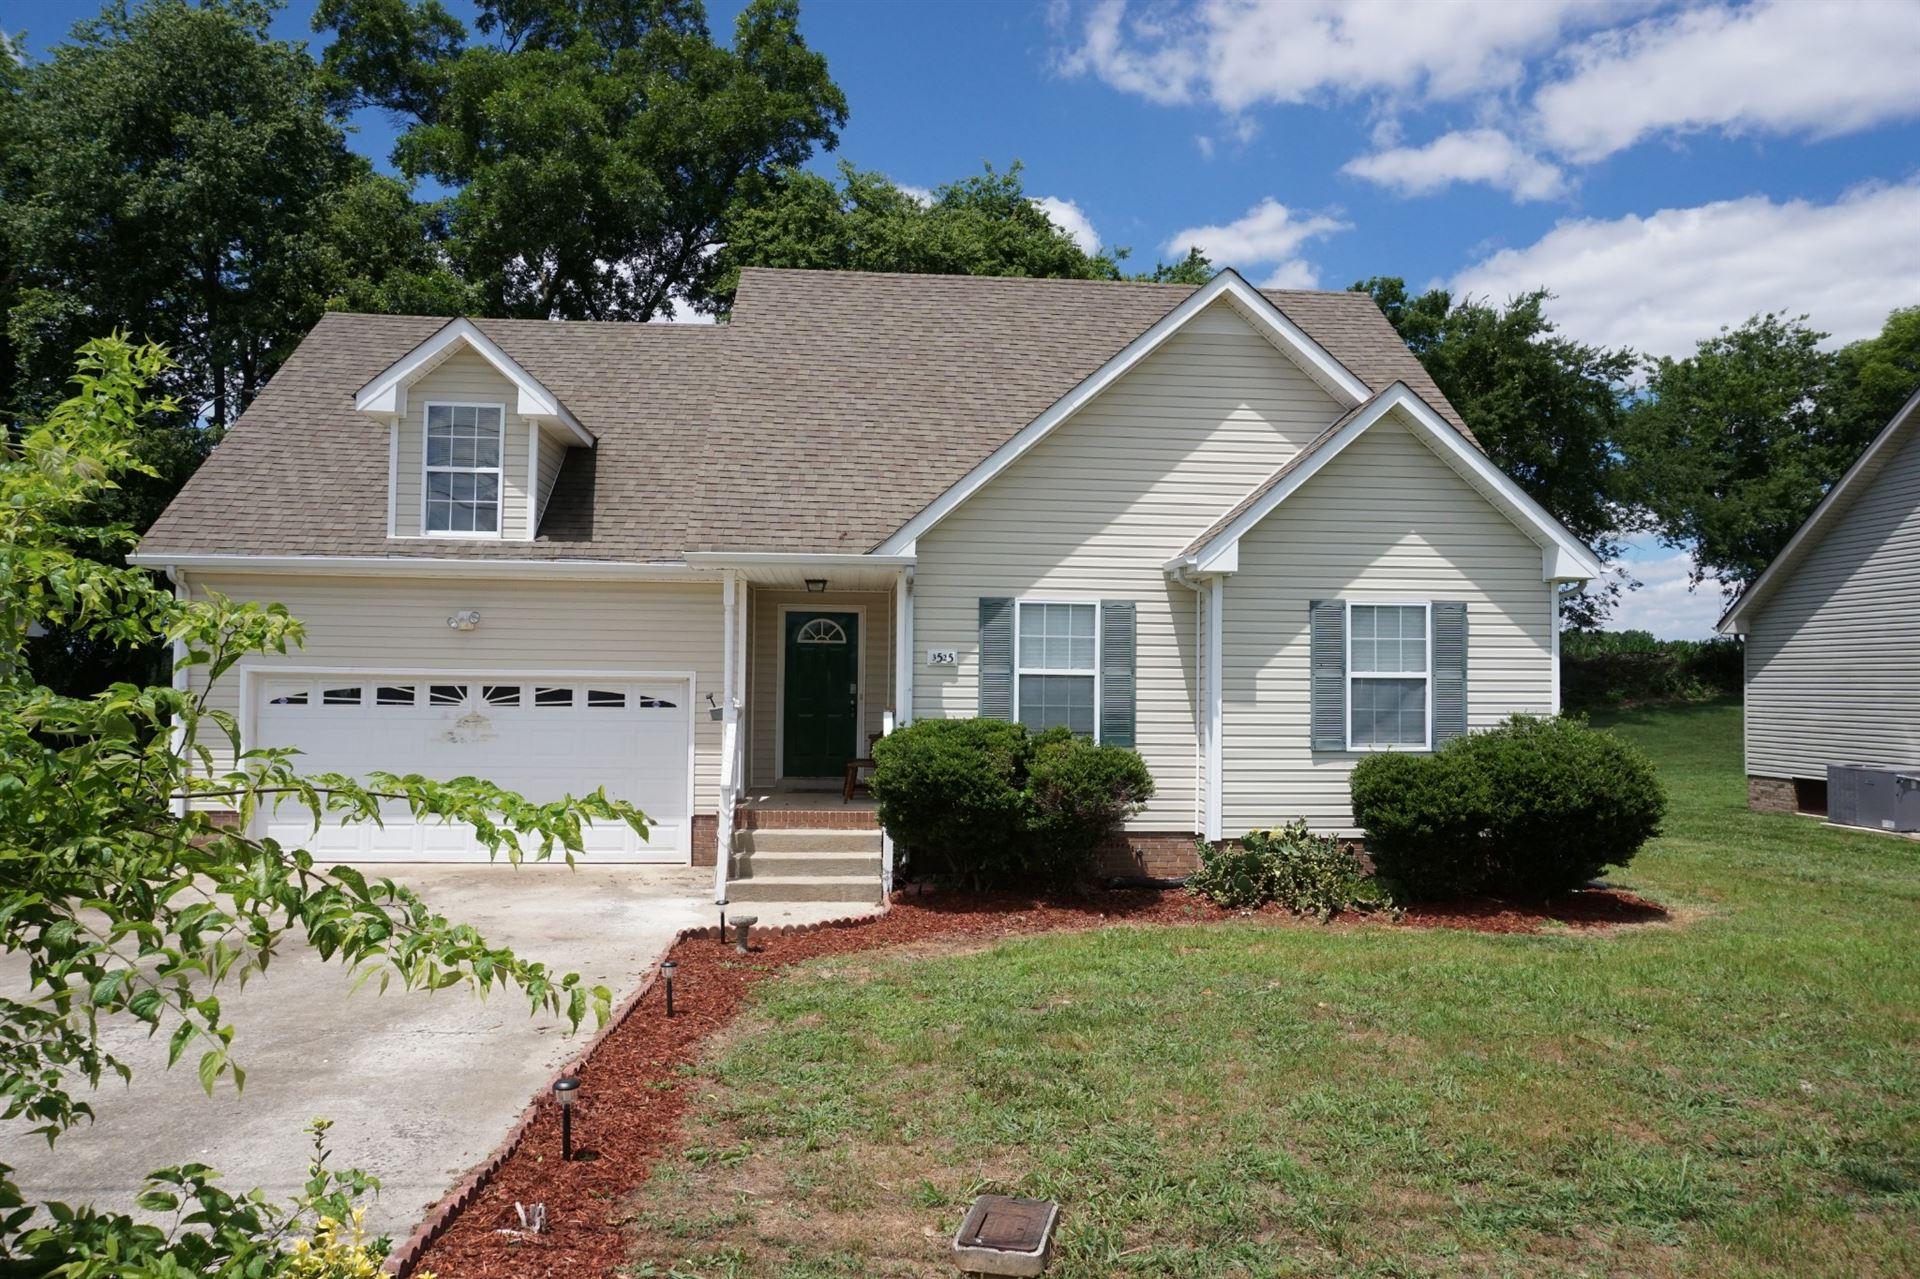 3525 Sandpiper Dr, Clarksville, TN 37042 - MLS#: 2265407